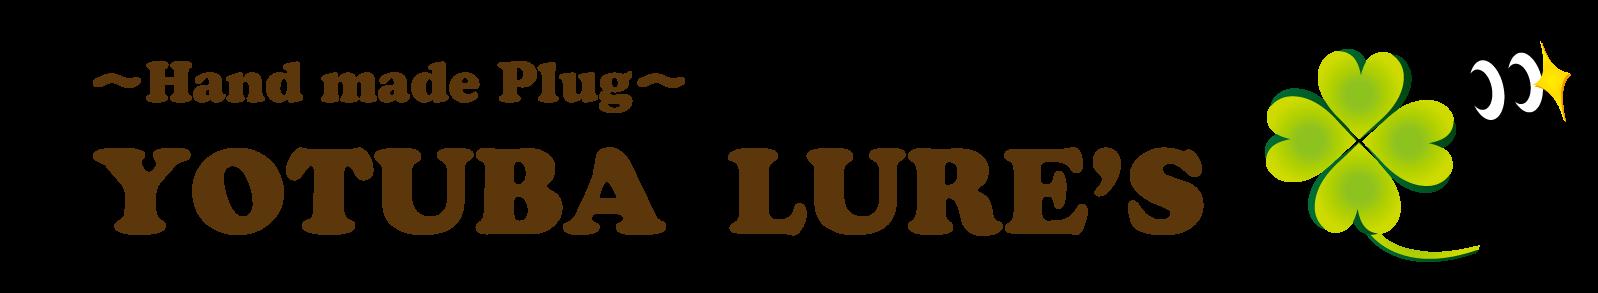 YOTUBA LURE'S